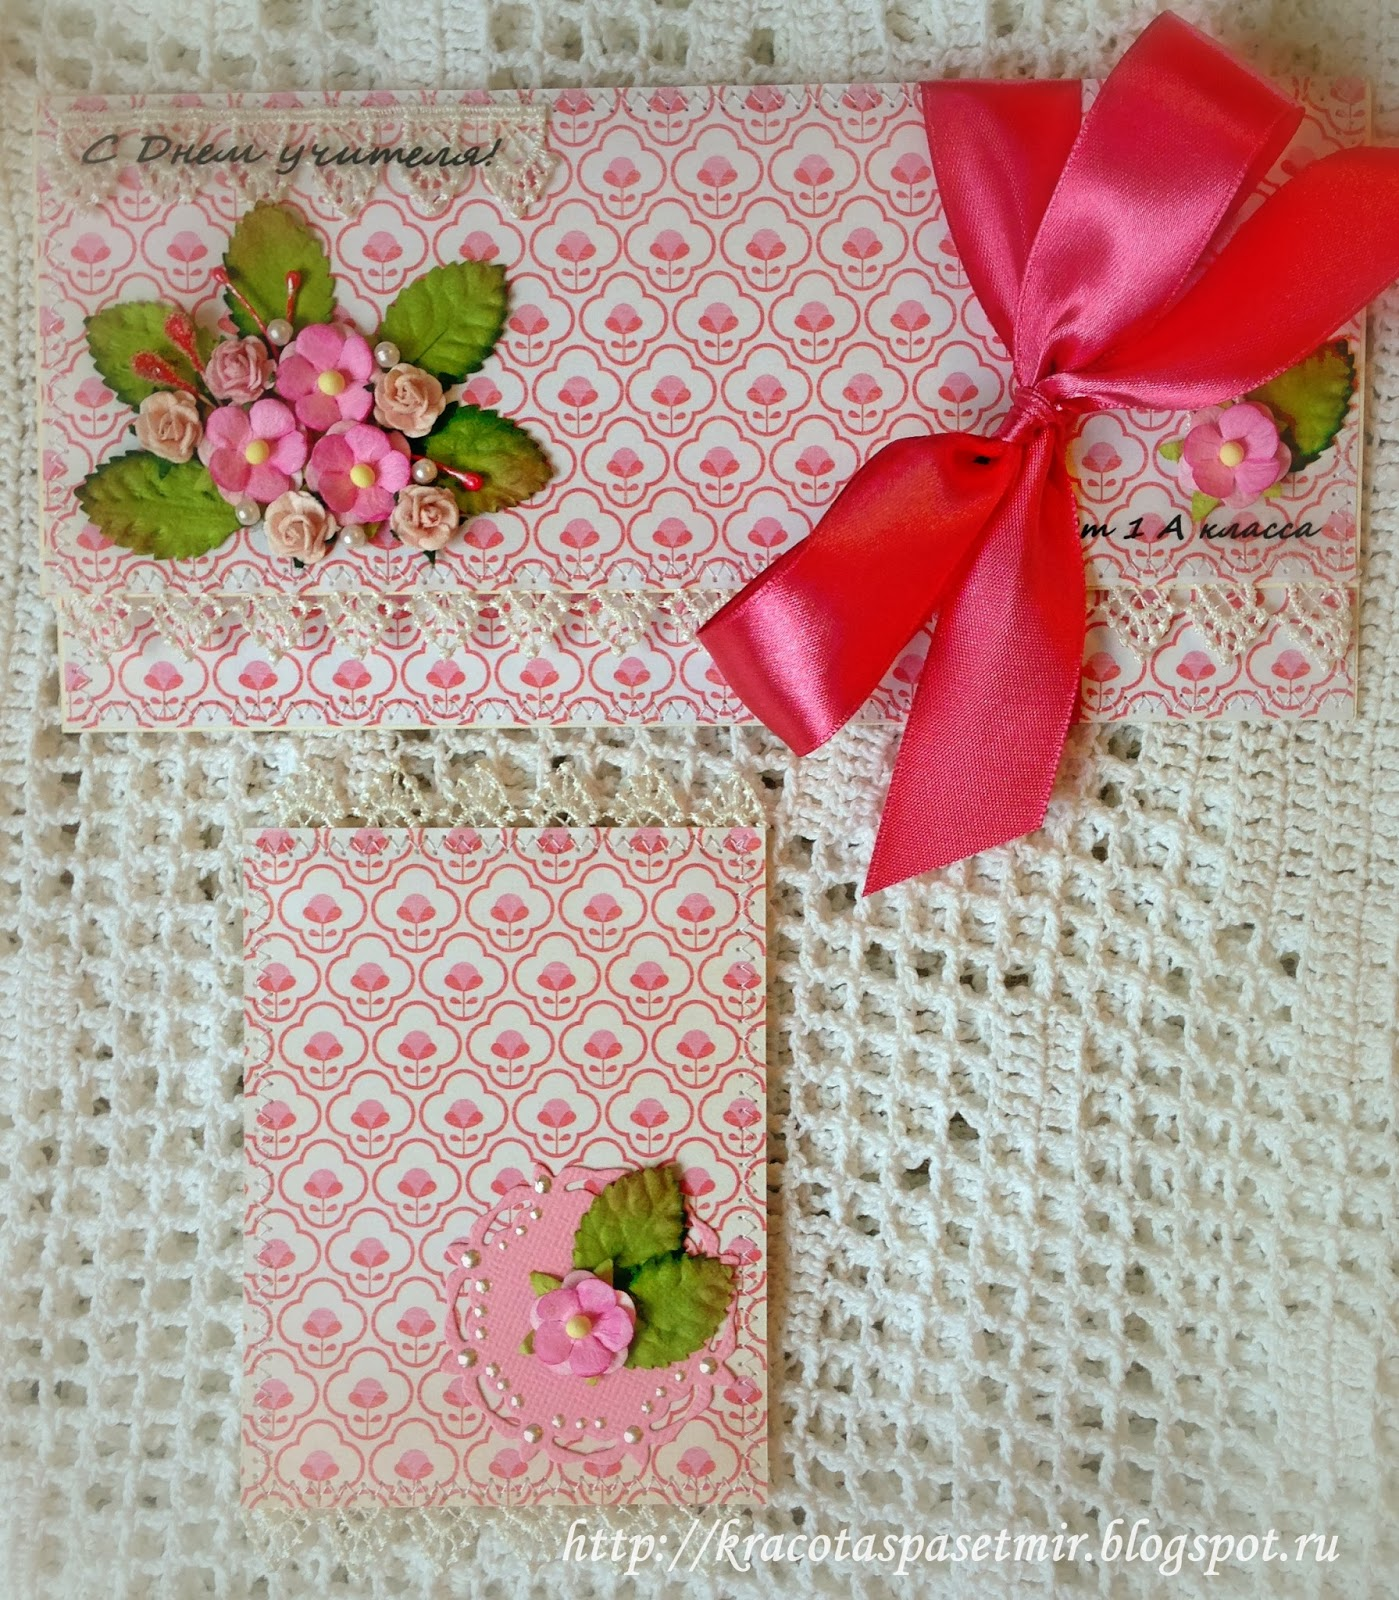 Конверт для открытки бабушке